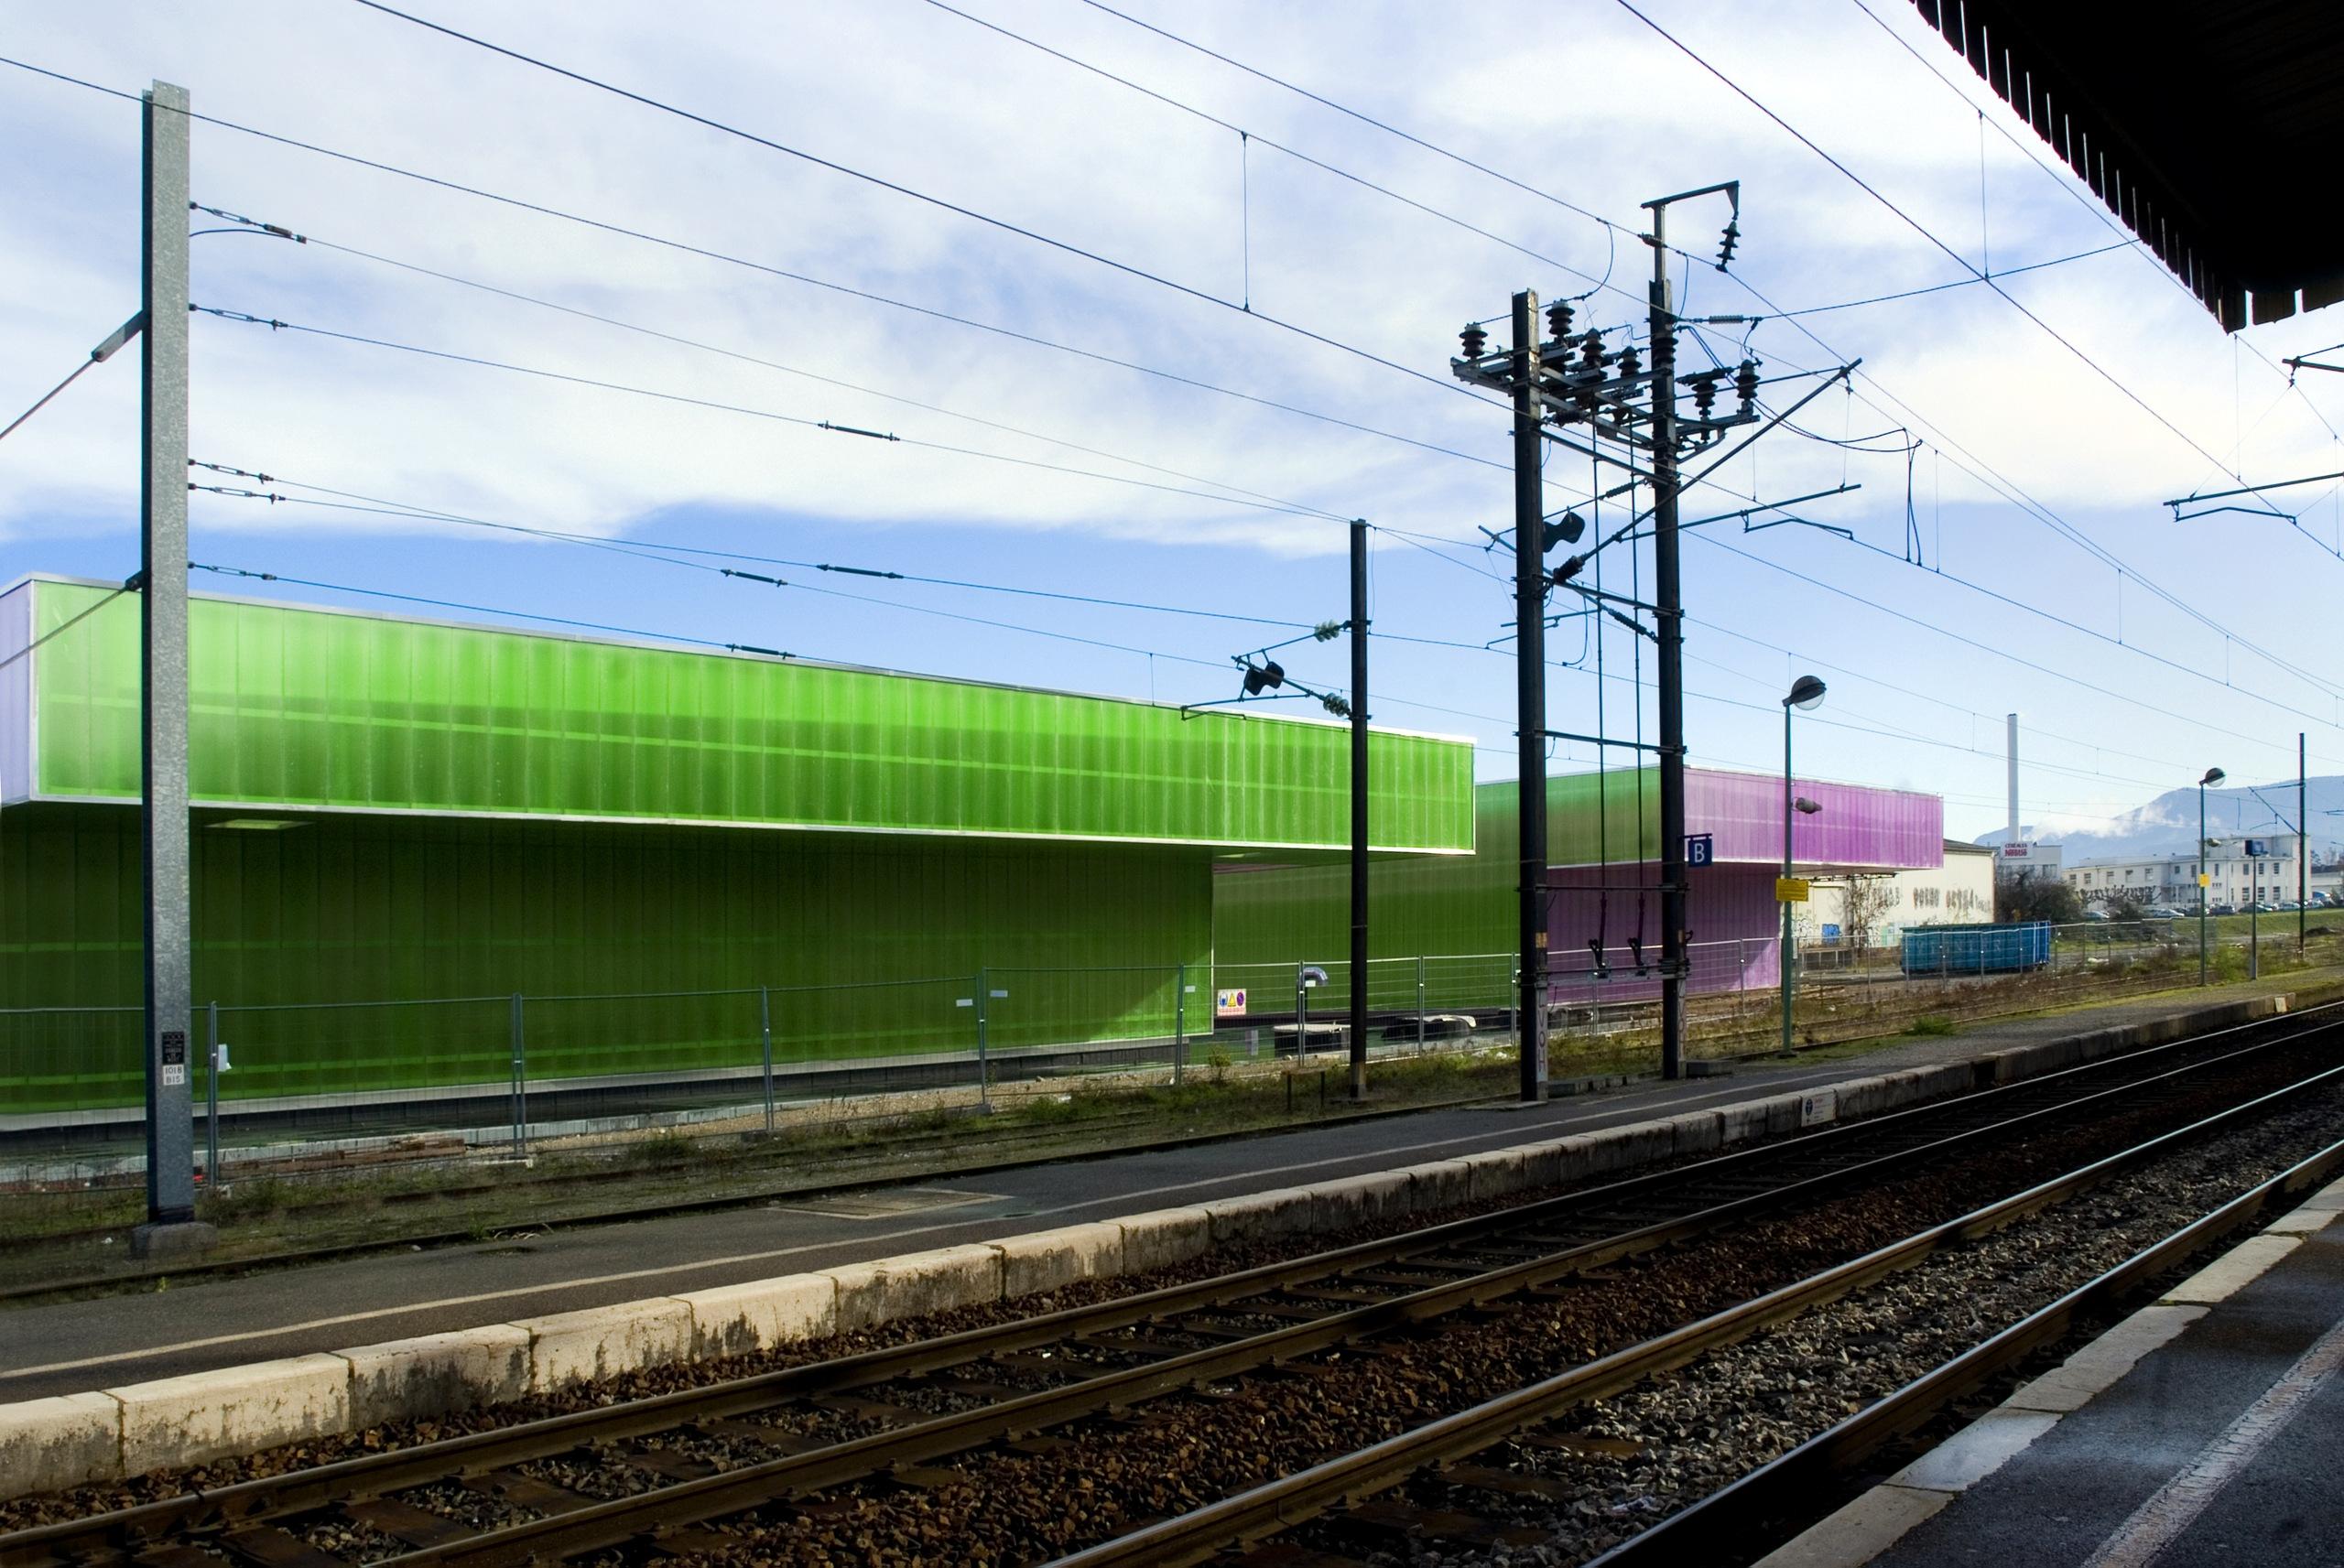 Gymnase de Monéry, rue de l'Industrie, Rumilly, Architecte Philippe Guyard, 2010.